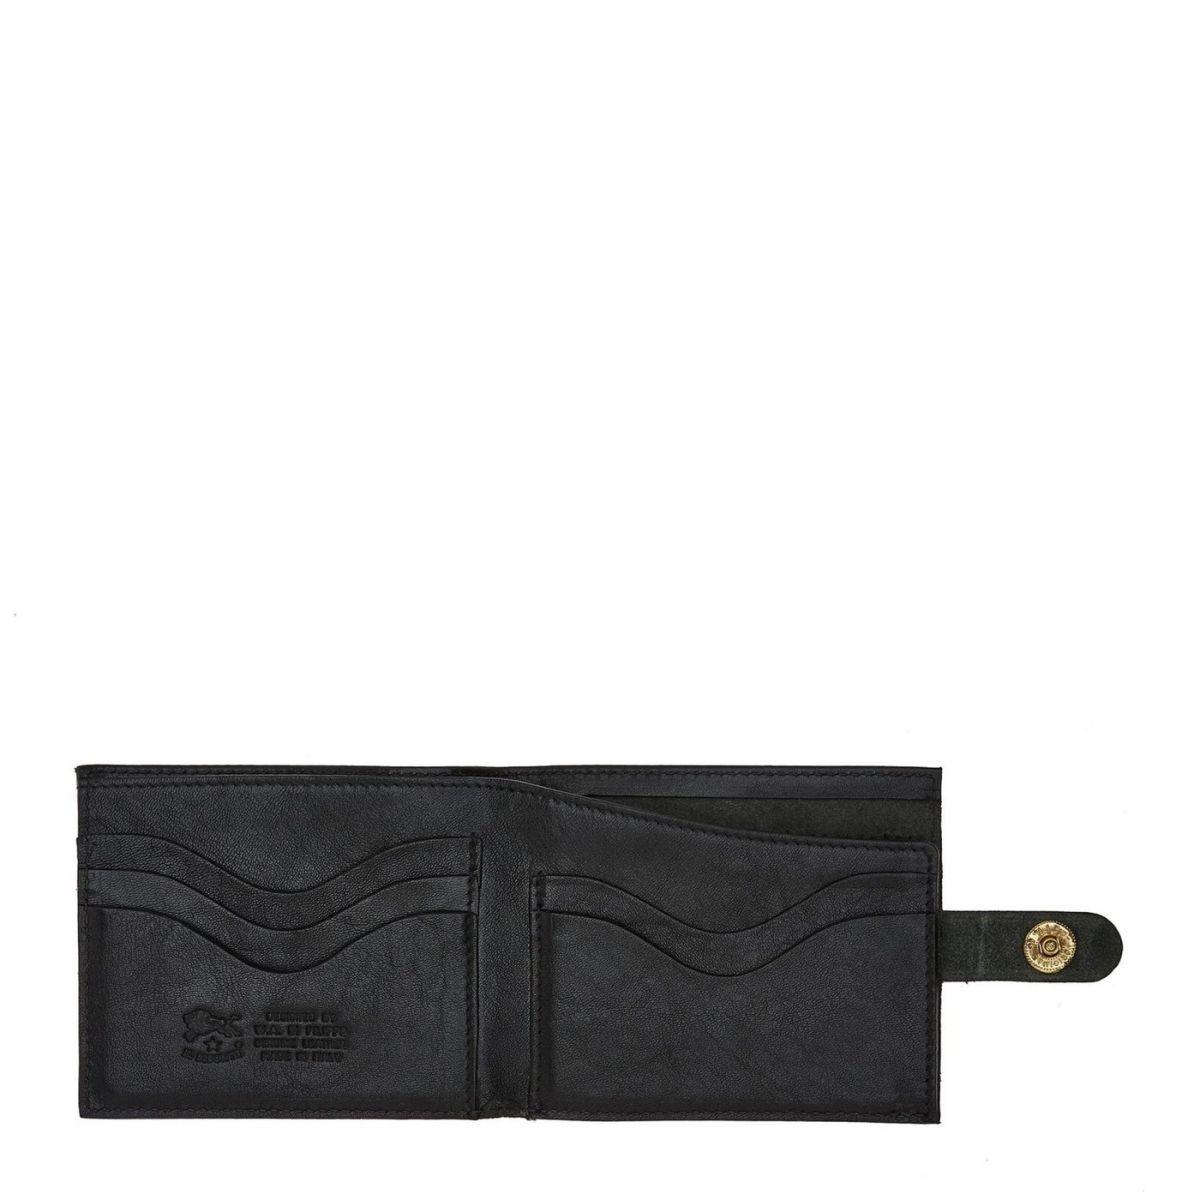 Men's Bi-Fold Wallet  in Cowhide Double Leather SBW034 color Black | Details